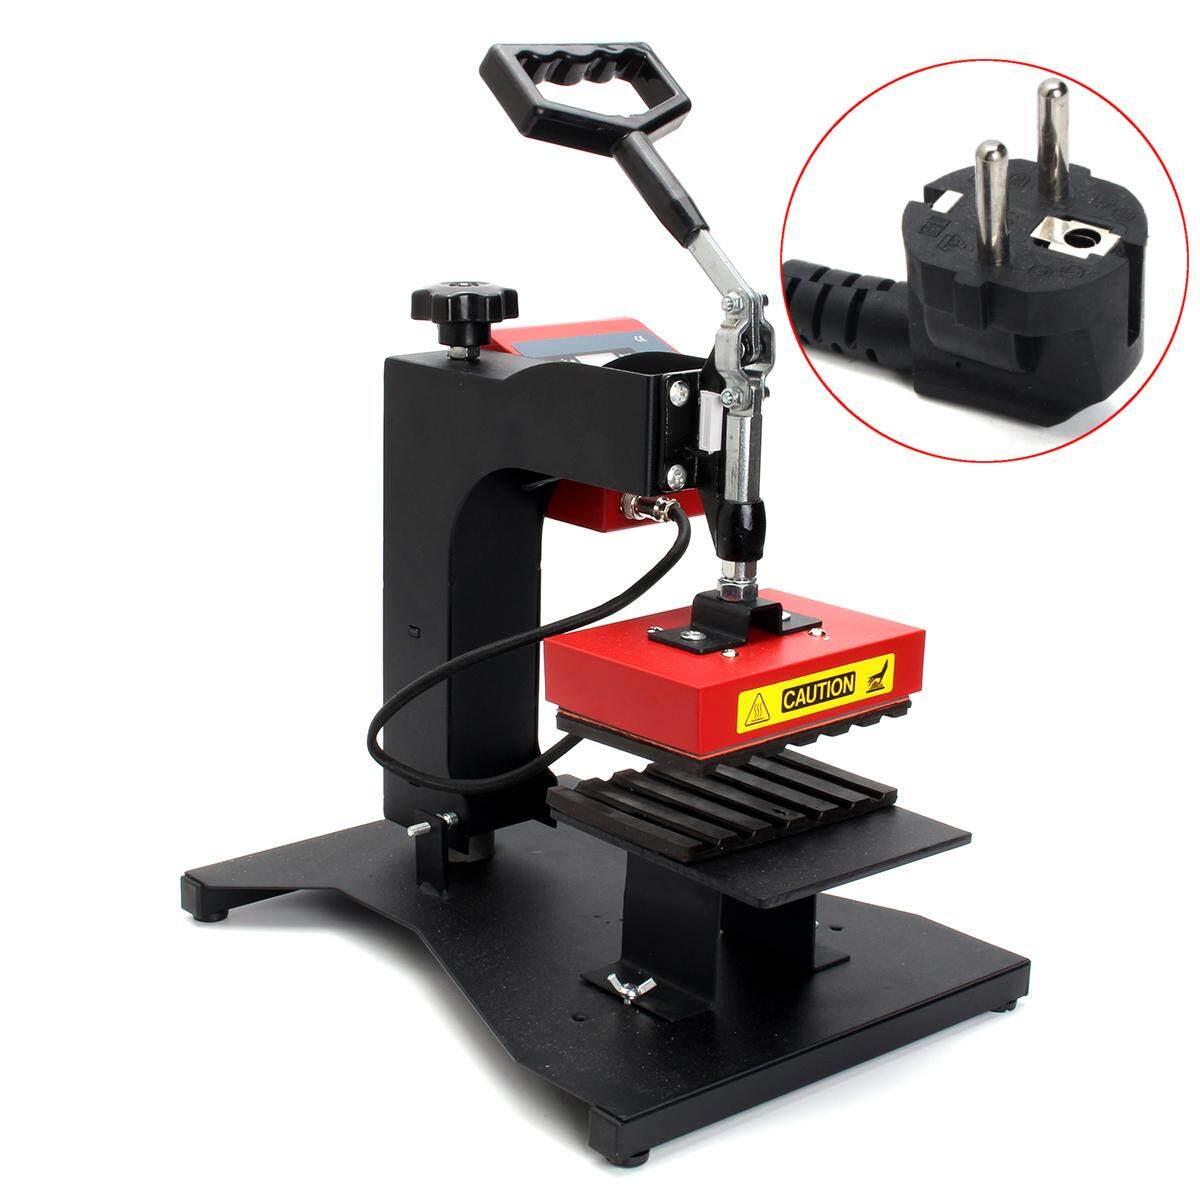 6 Pcs Digital Pen Heat Press Machine For Pen Heat Transfer Printing220v(eu Plug) By Glimmer.